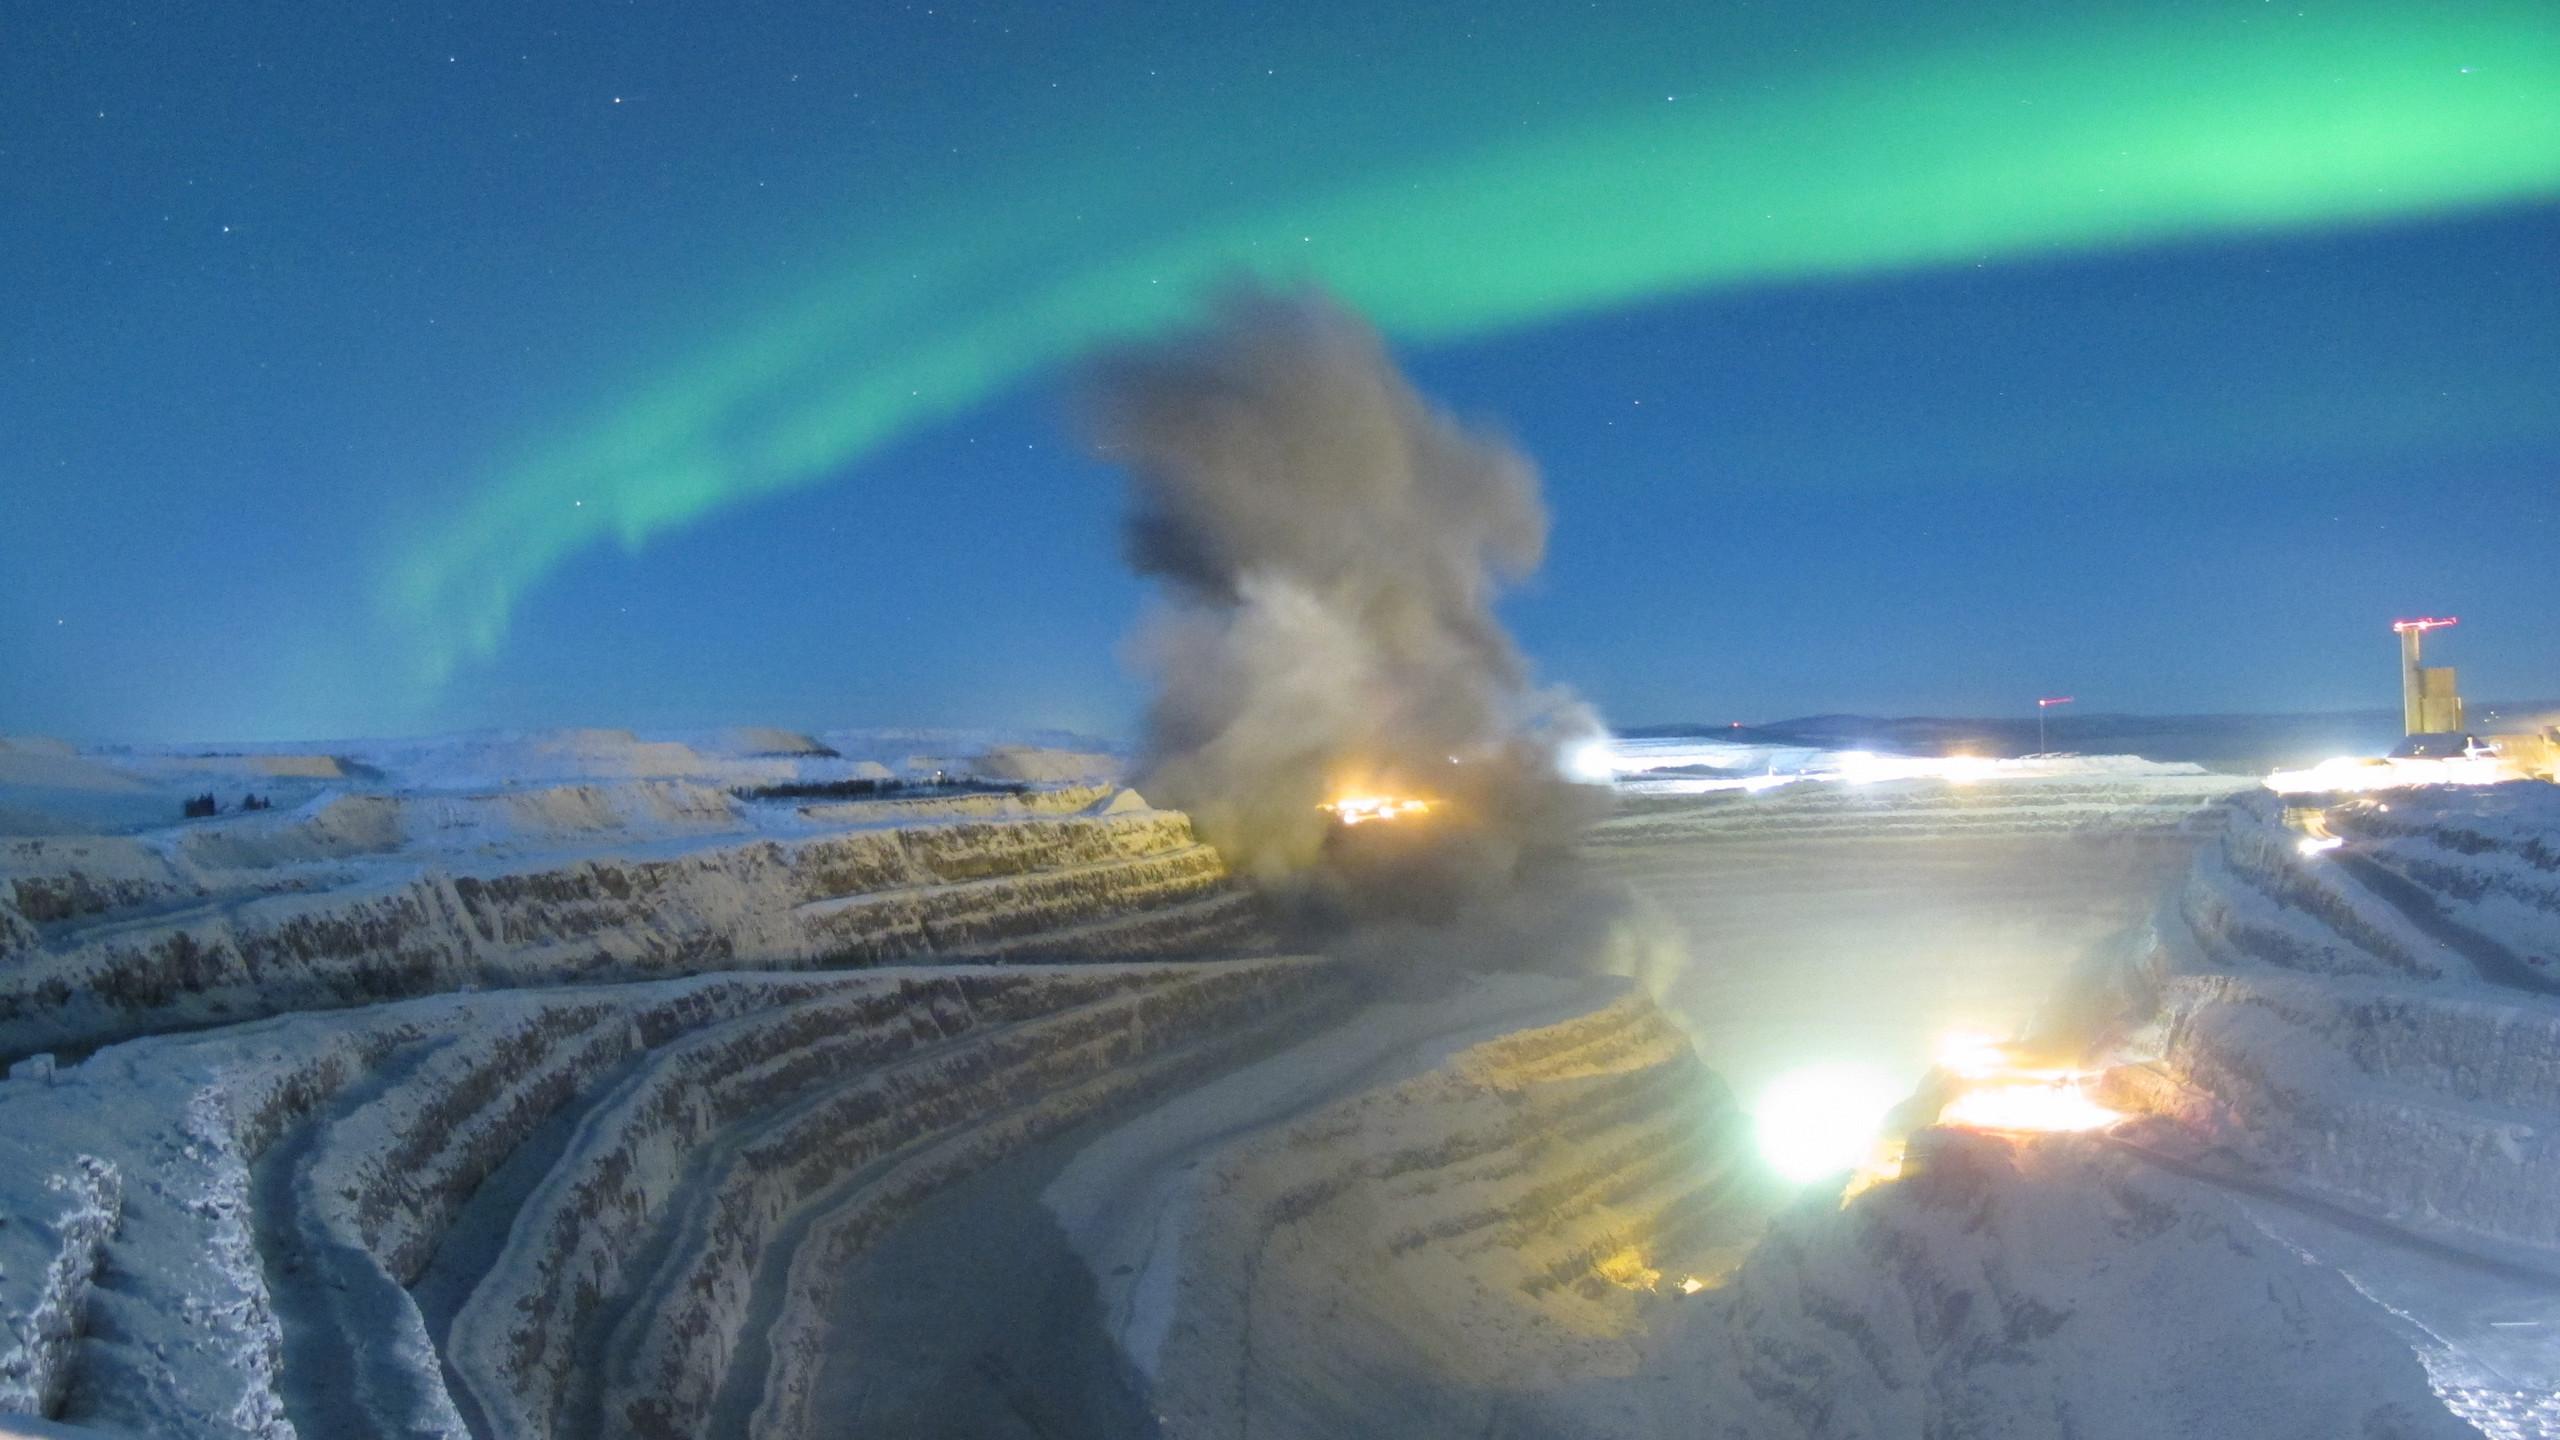 Northern lights over the Aitik mine in northern Sweden iimgurcom 2560x1440